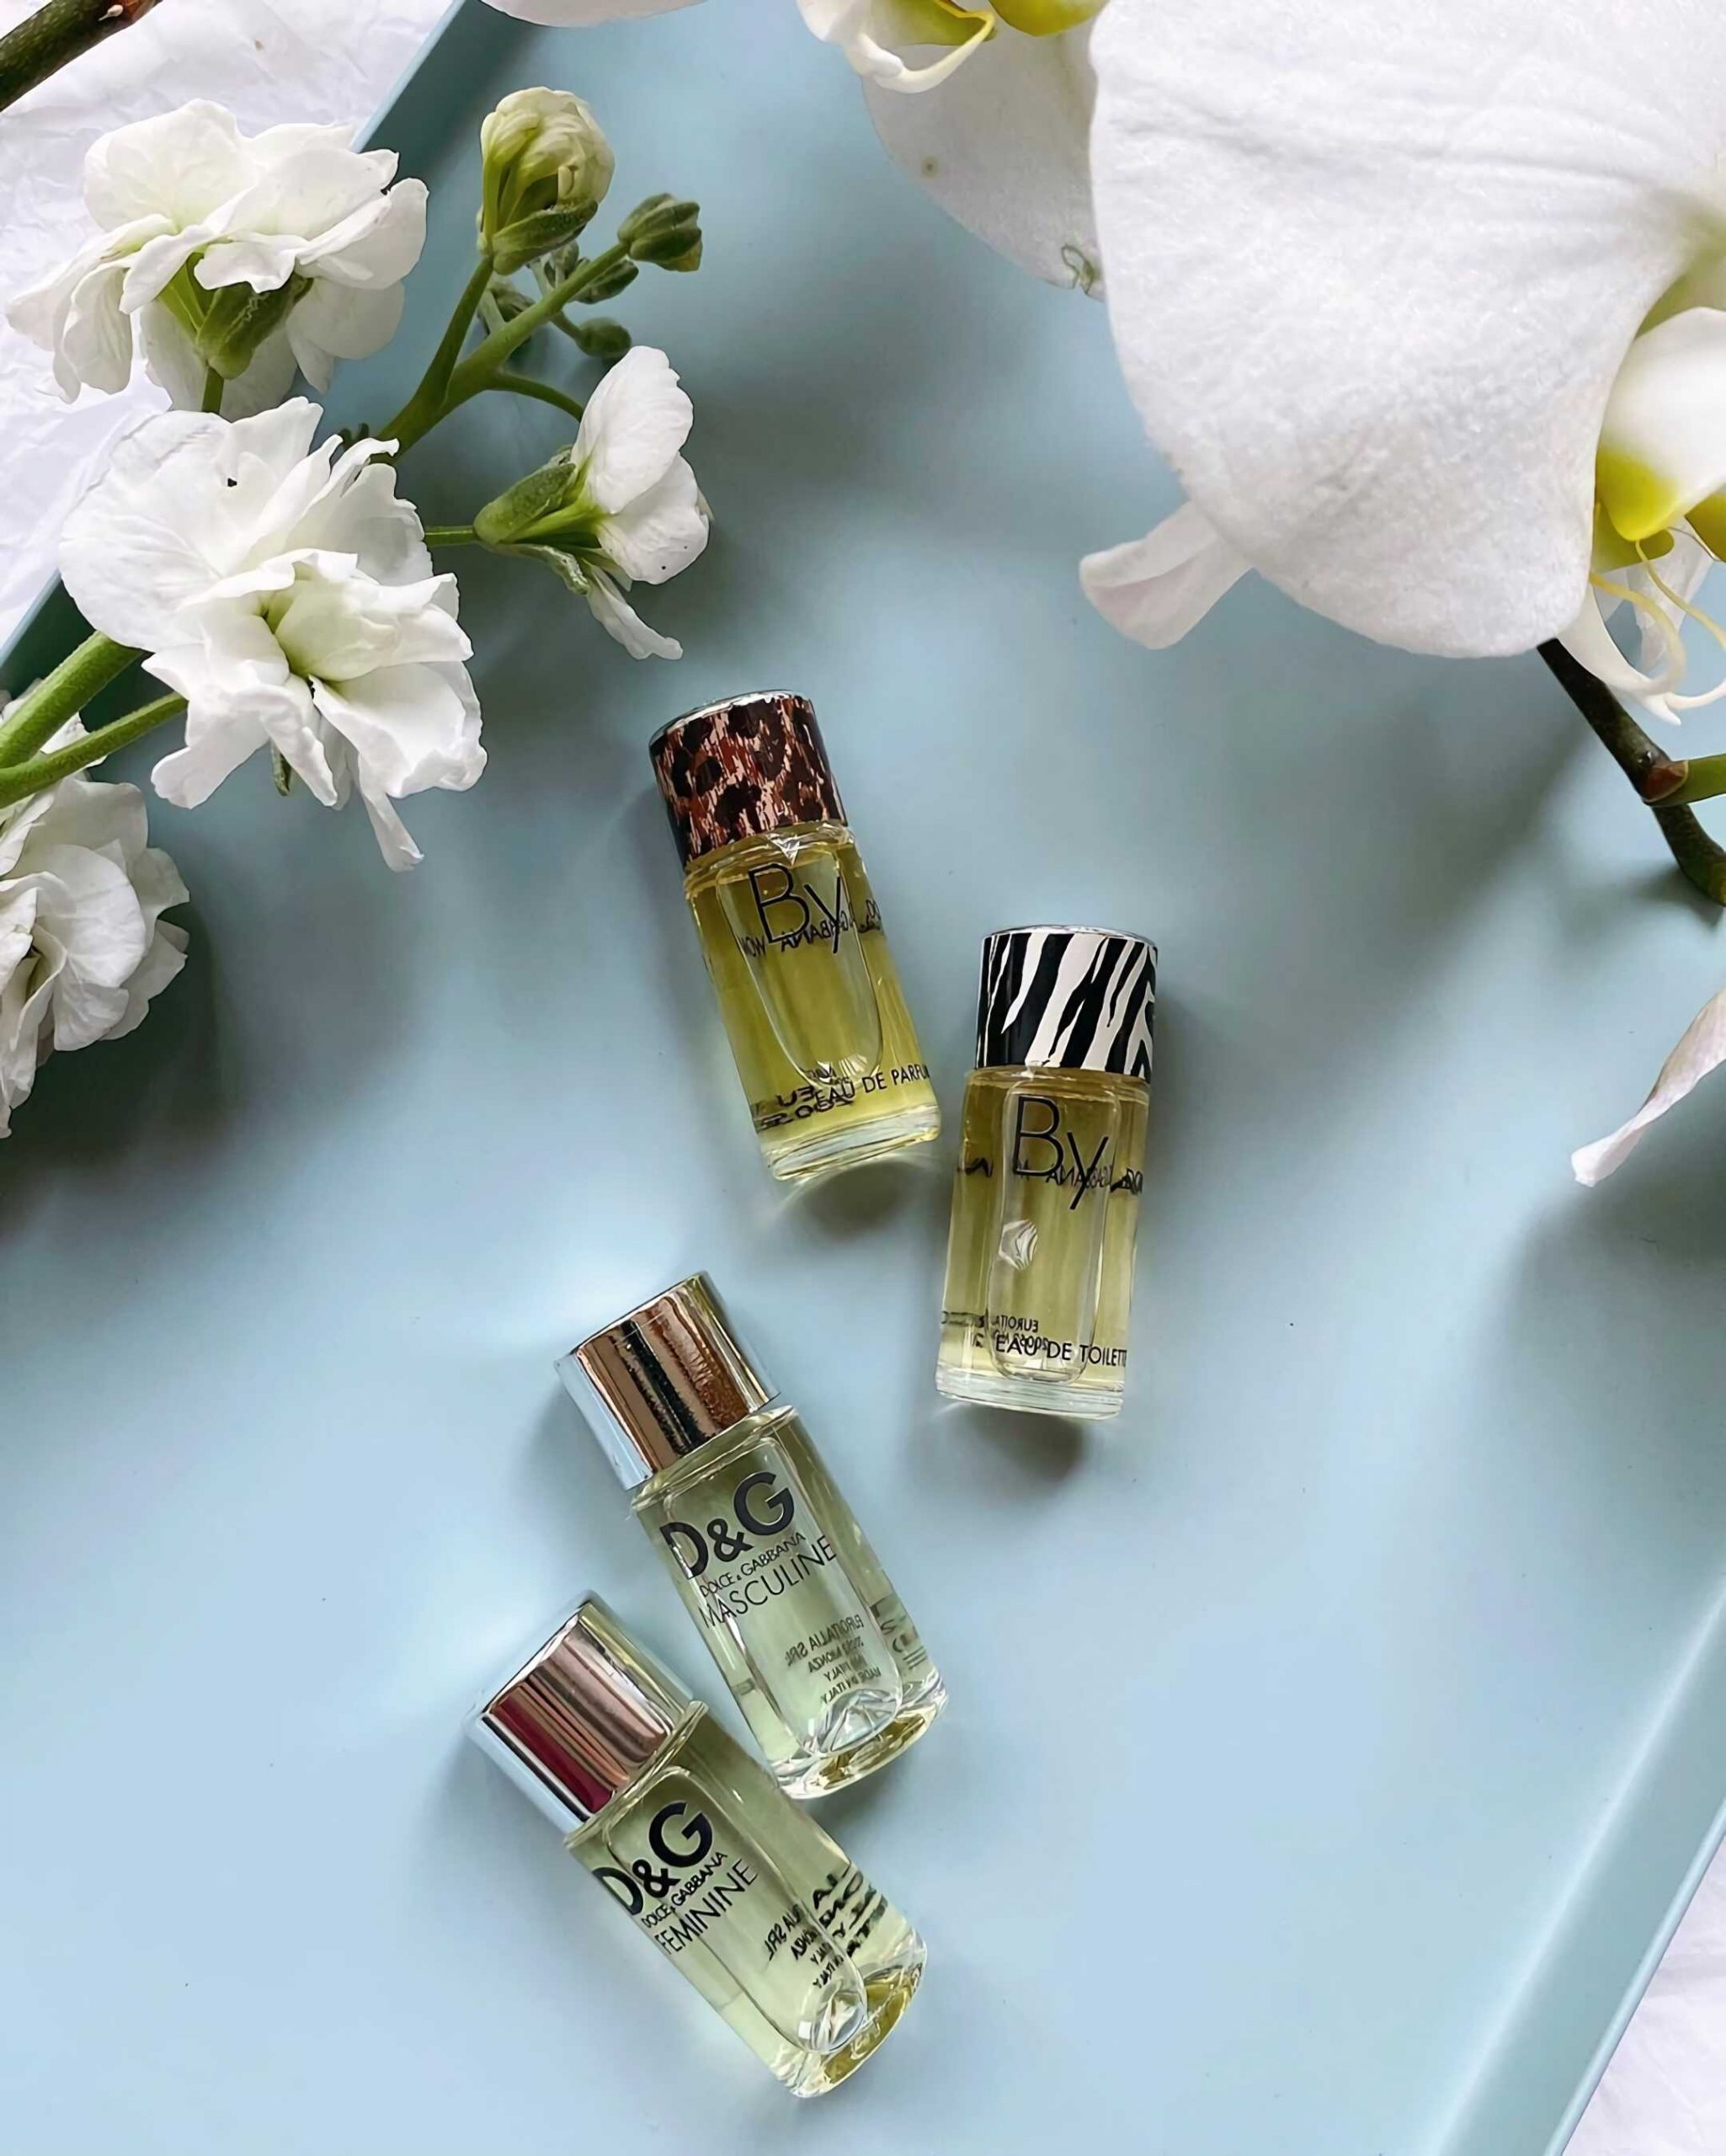 мужские духи с красивым запахом Dolce & Gabbana D&G Masculine